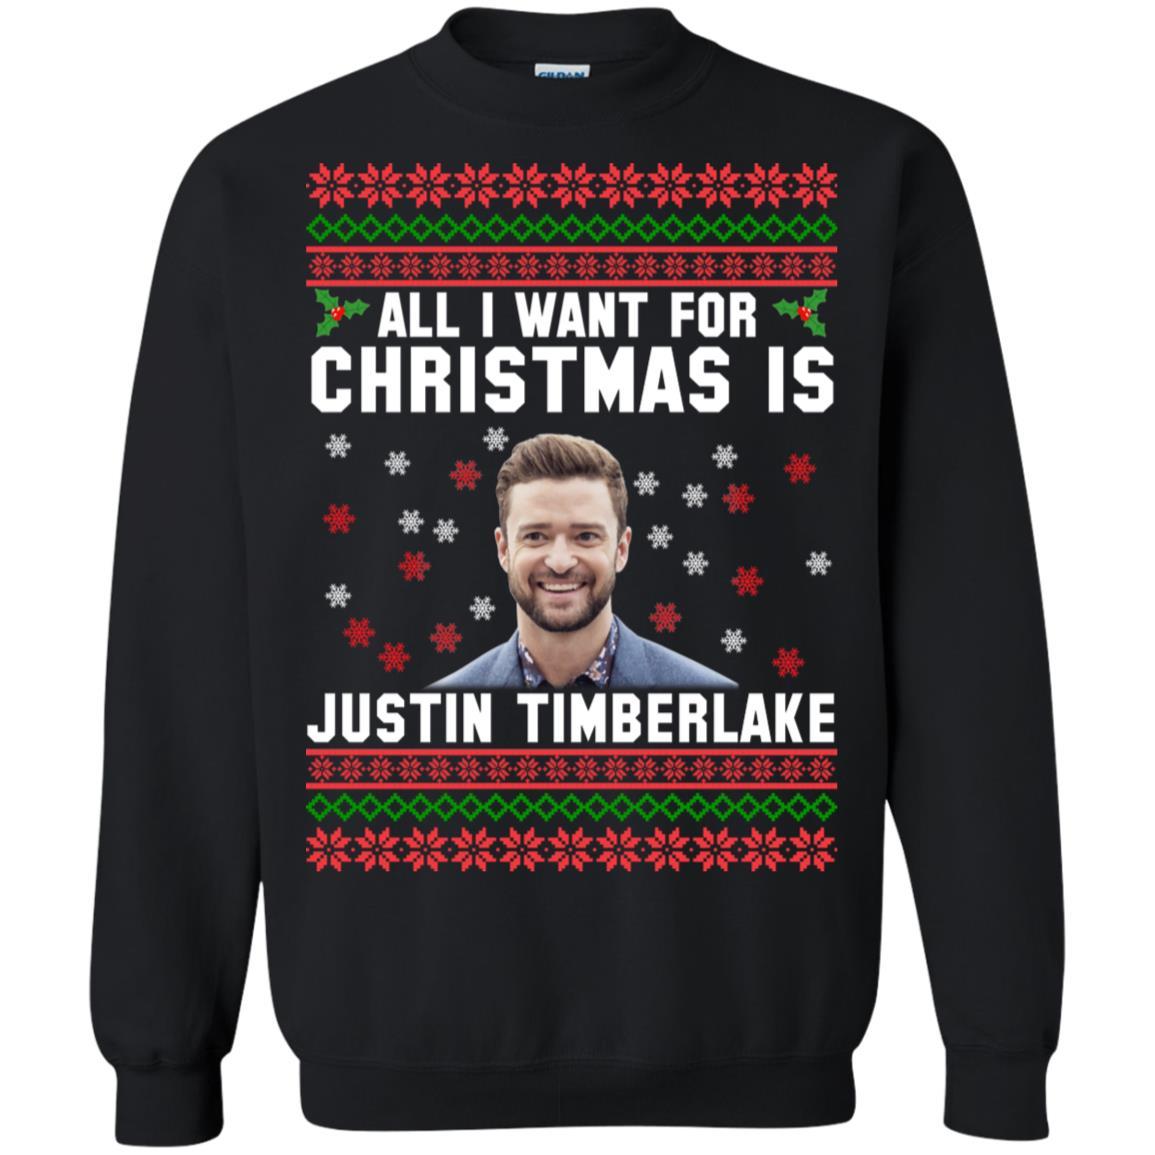 All I want for Christmas is Justin Timberlake sweatshirt, hoodie